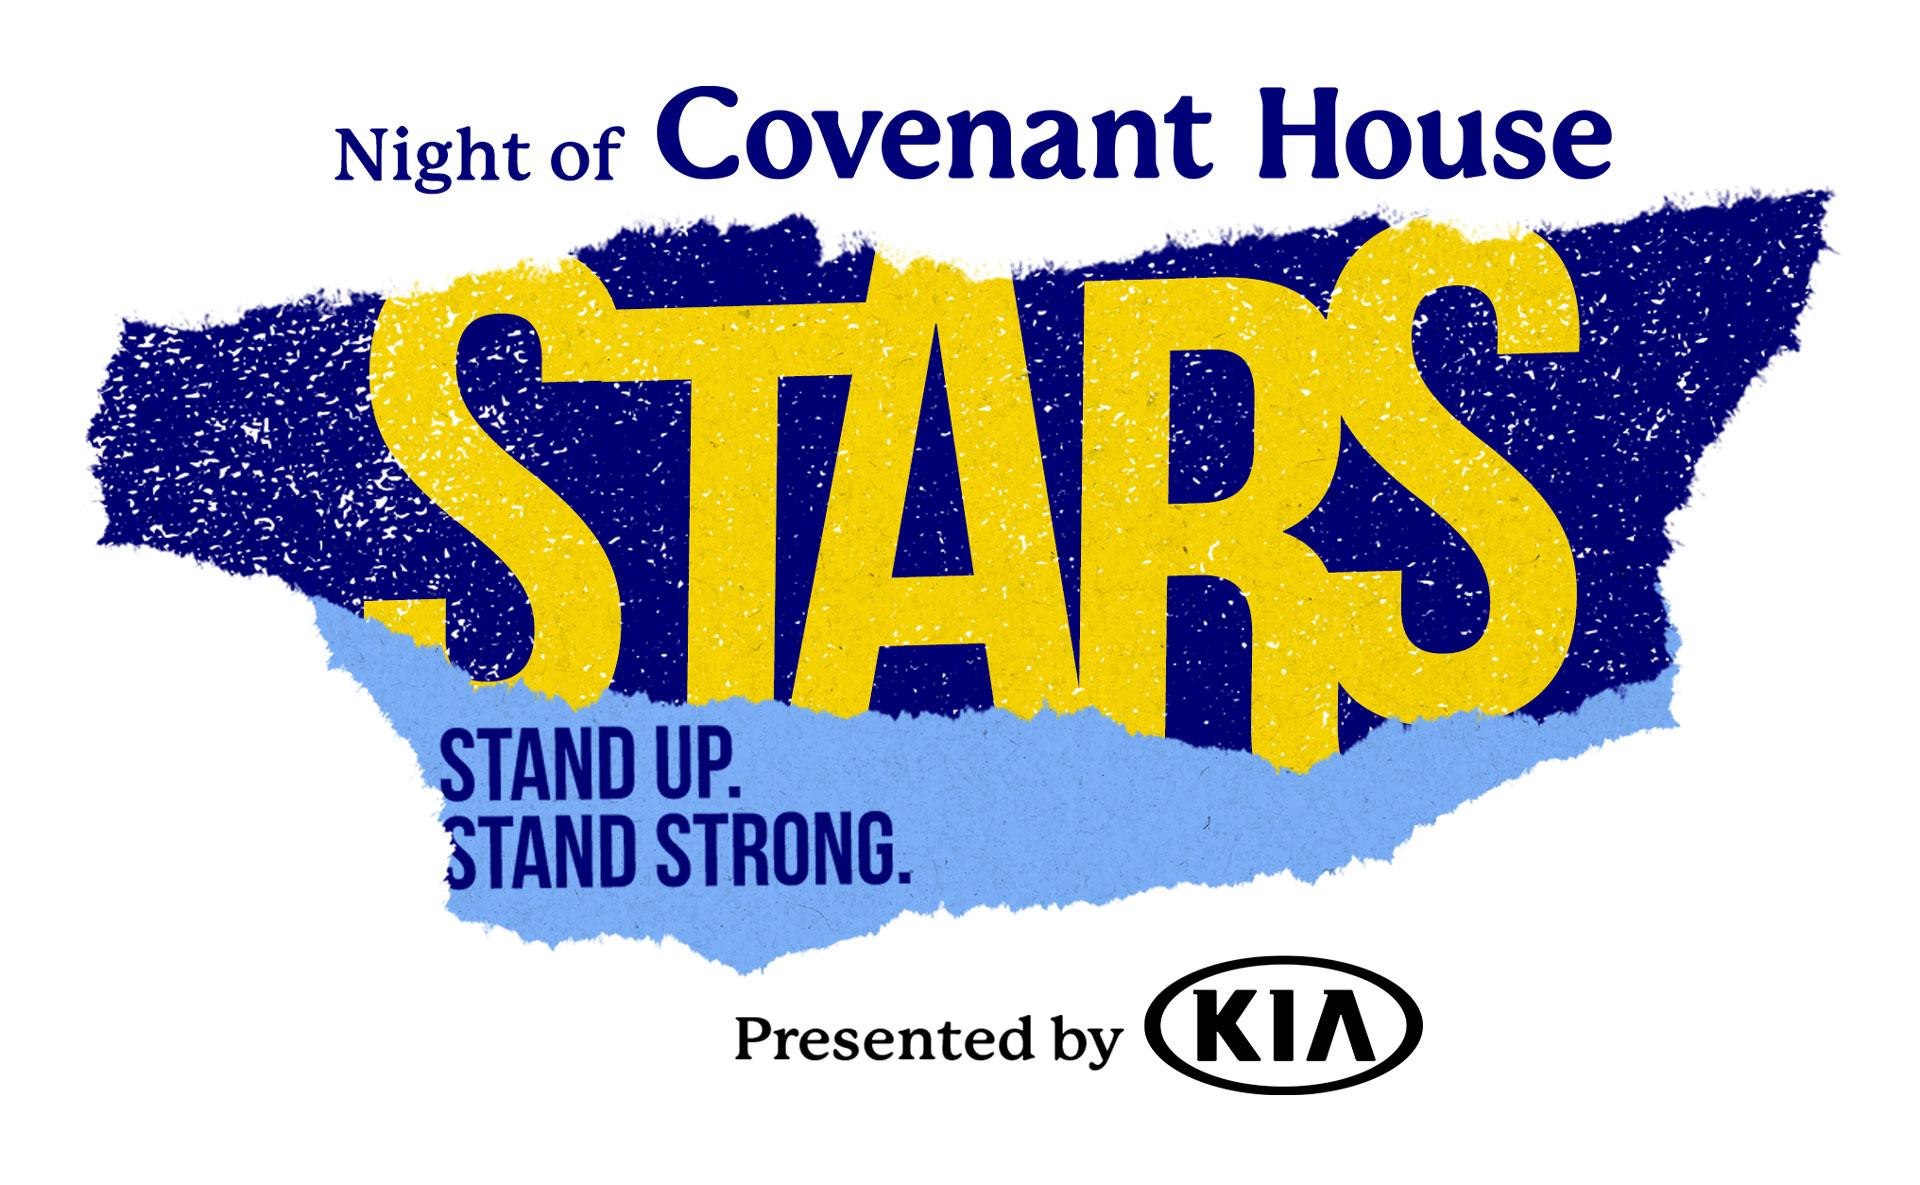 KIA汽车美国公司向COVENANT HOUSE捐款$250,000 继续「ACCELERATE THE GOOD」